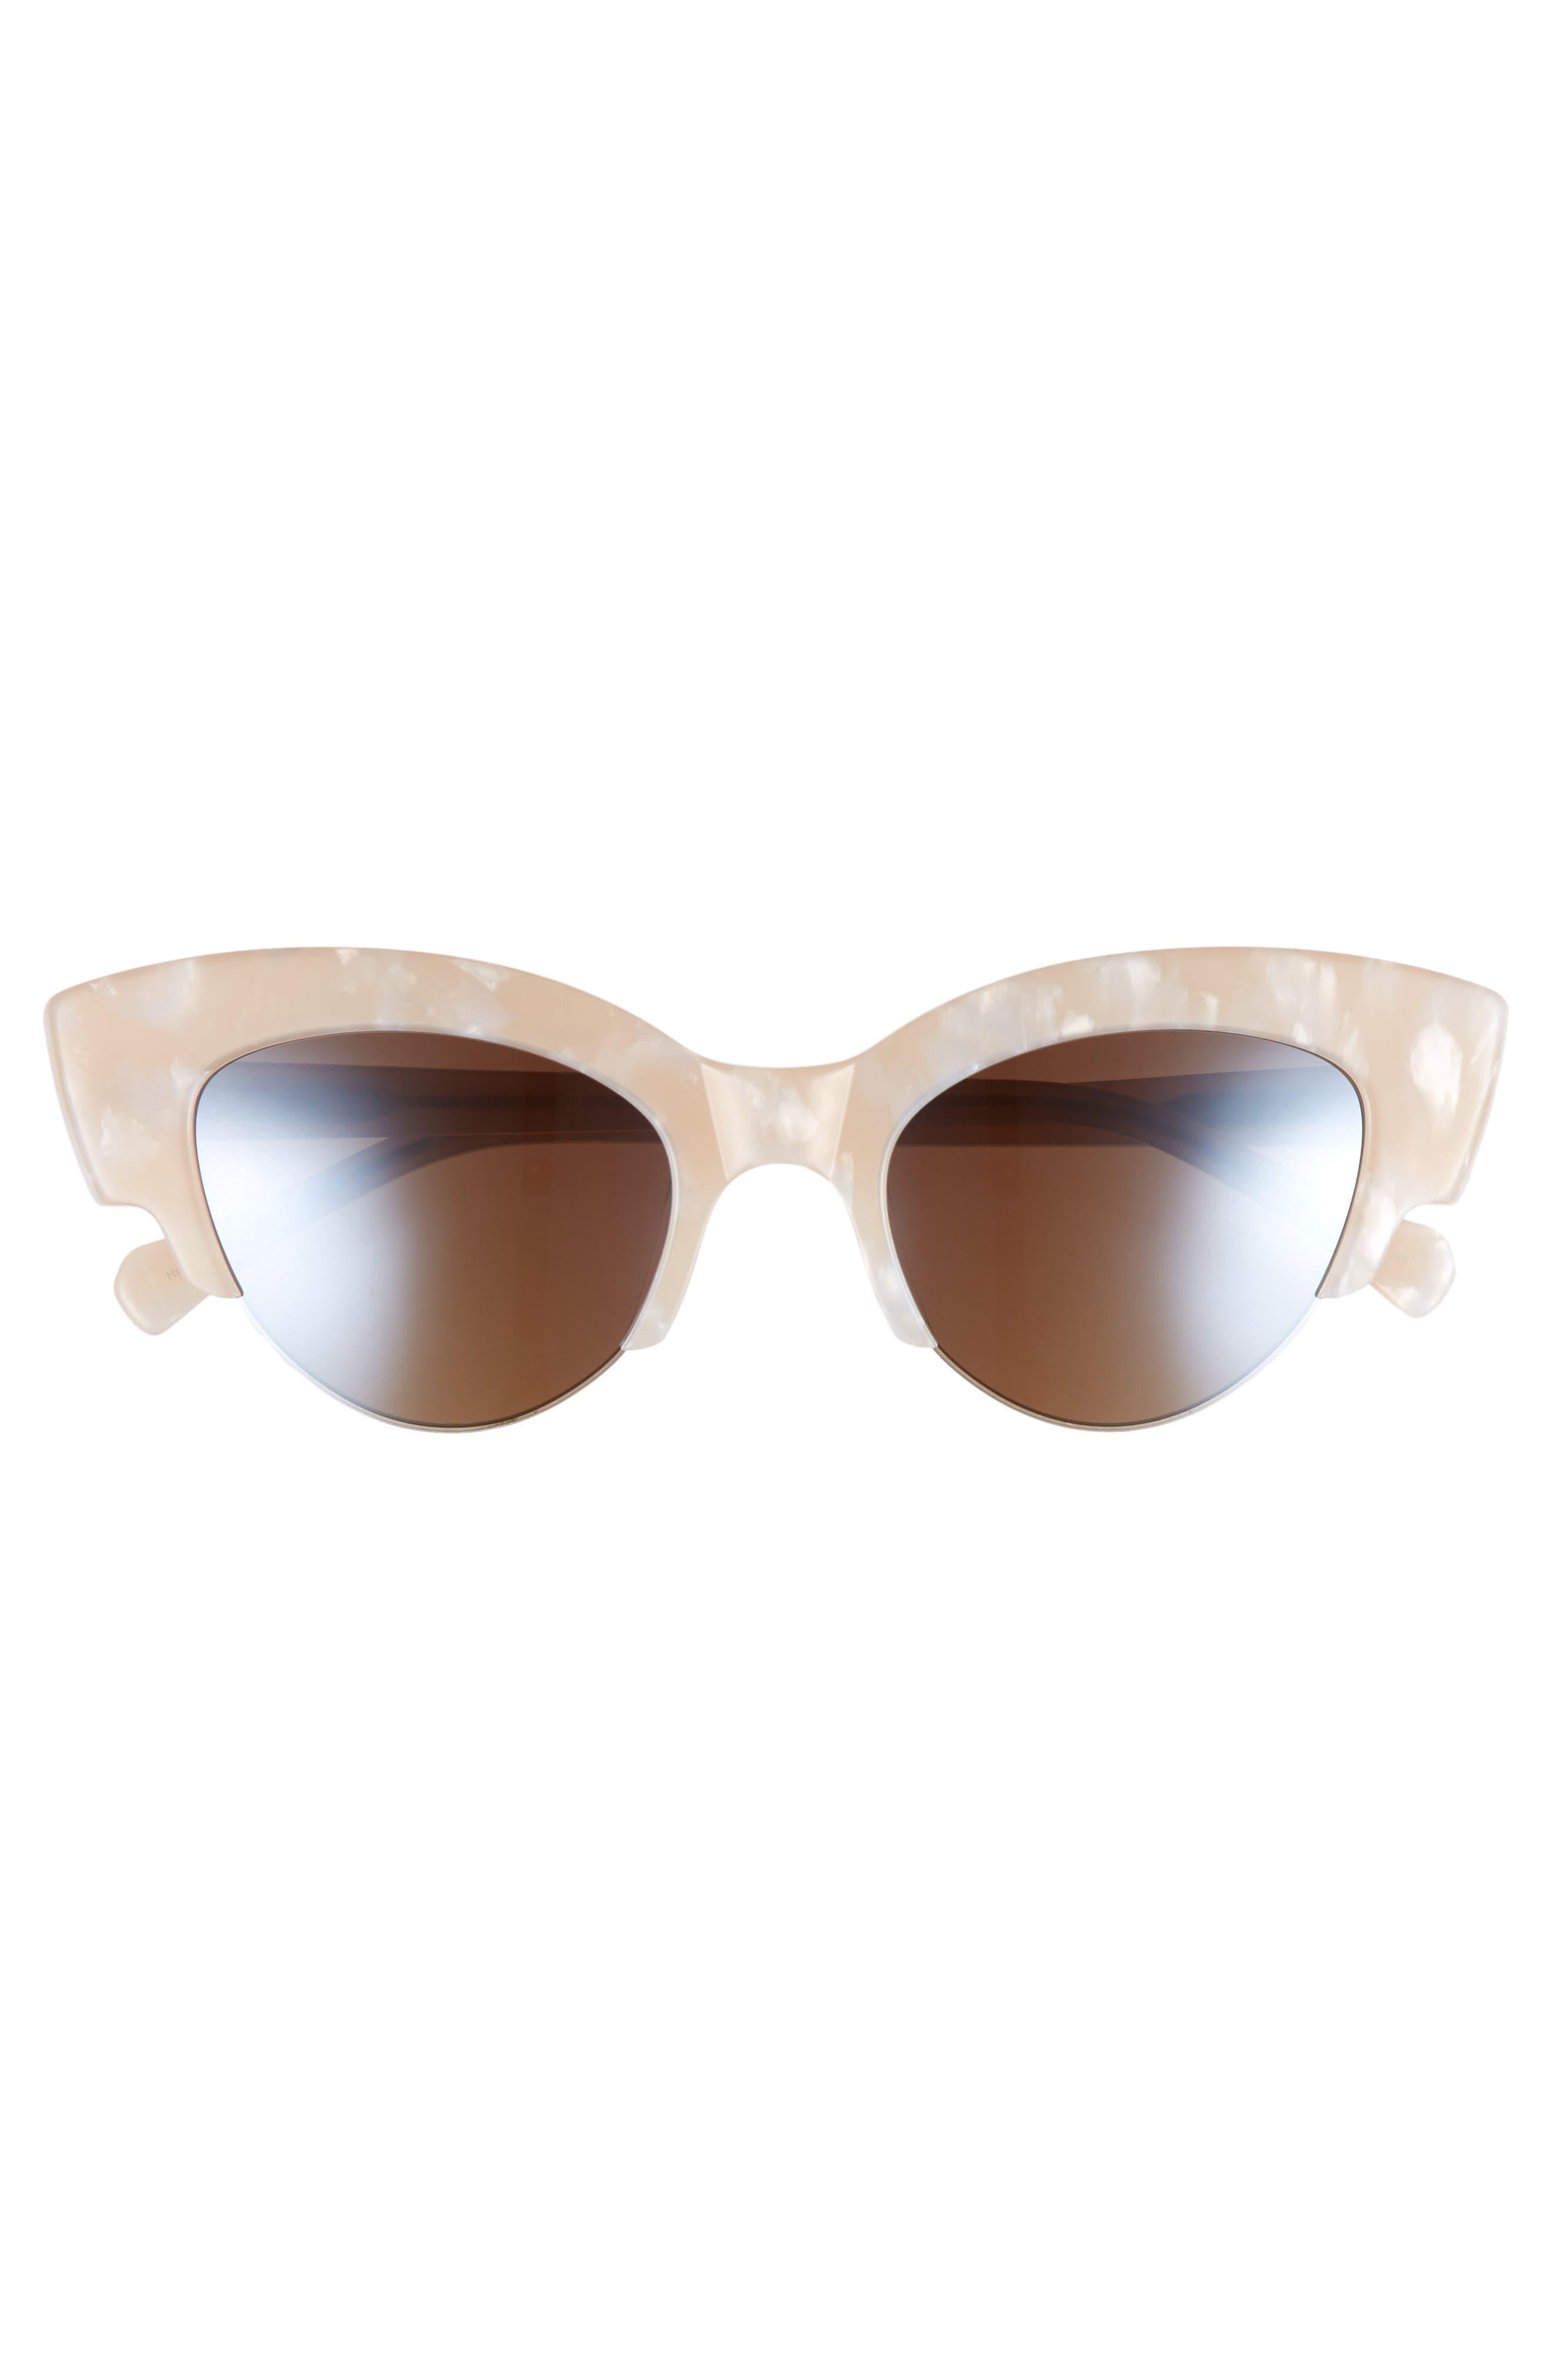 Winona Cat Eye Sunglasses,                             Alternate thumbnail 2, color,                             Marble/ Cream